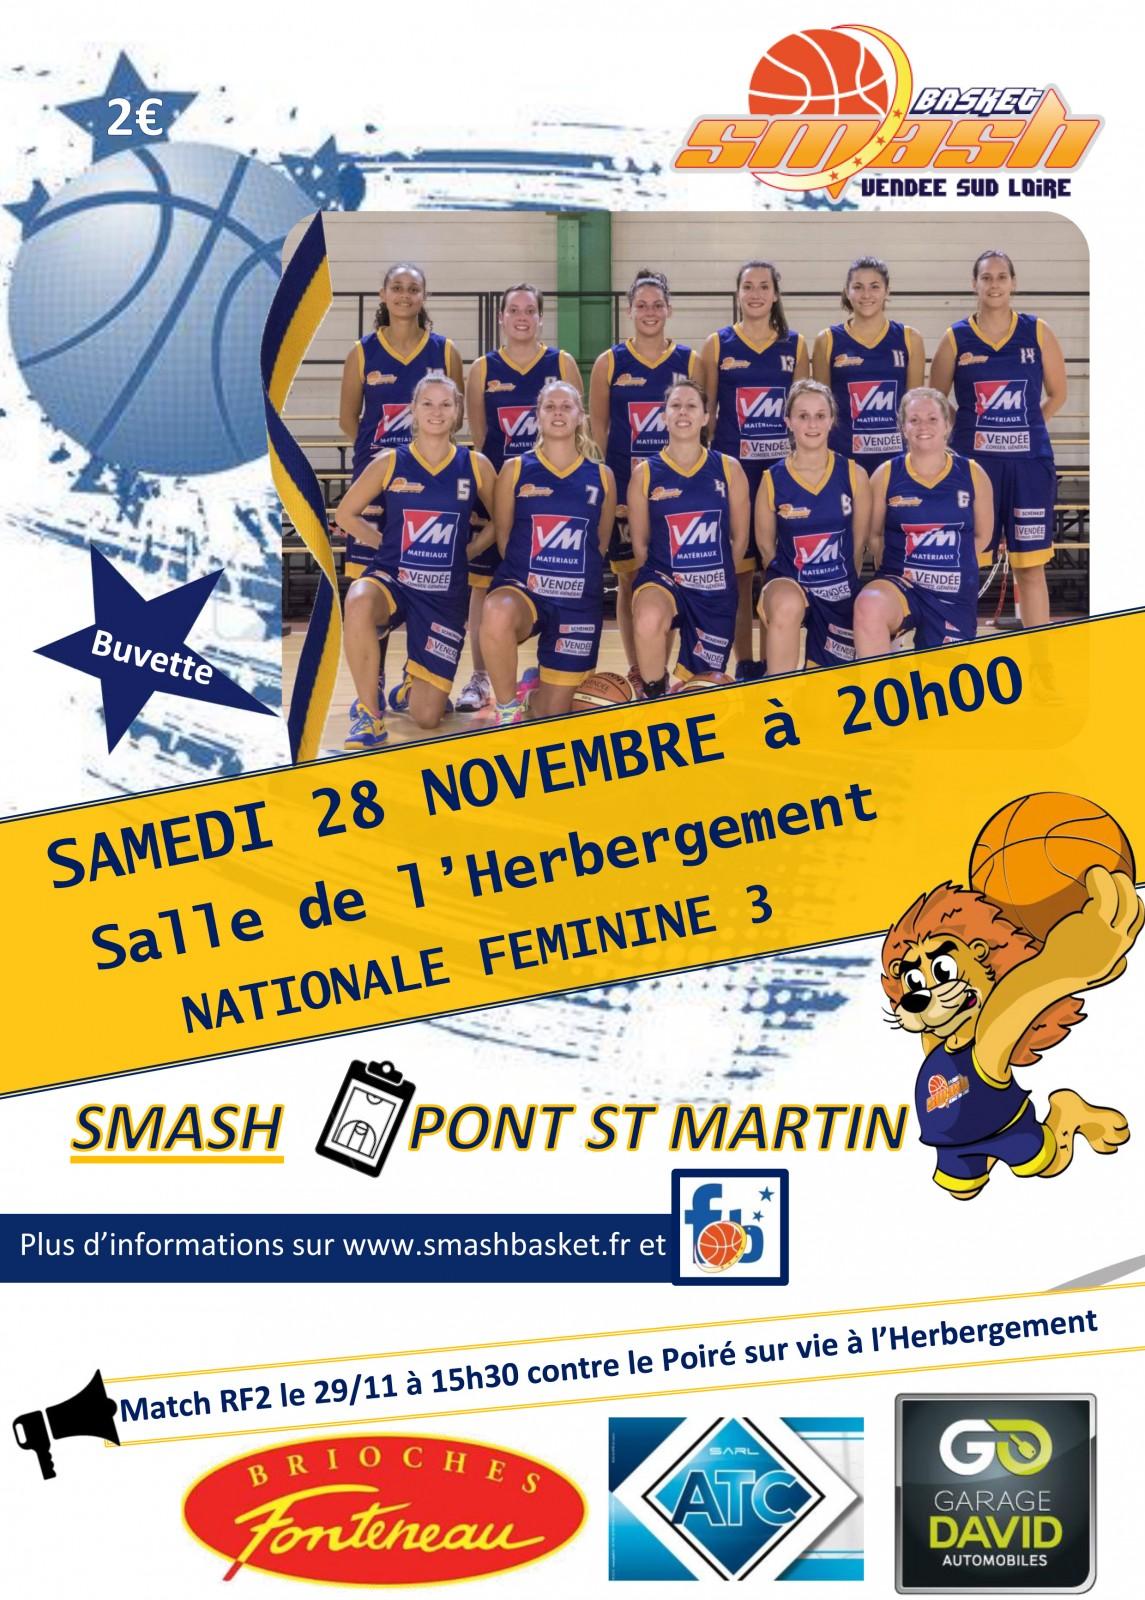 affiche match nf3 Pont St Martin 1